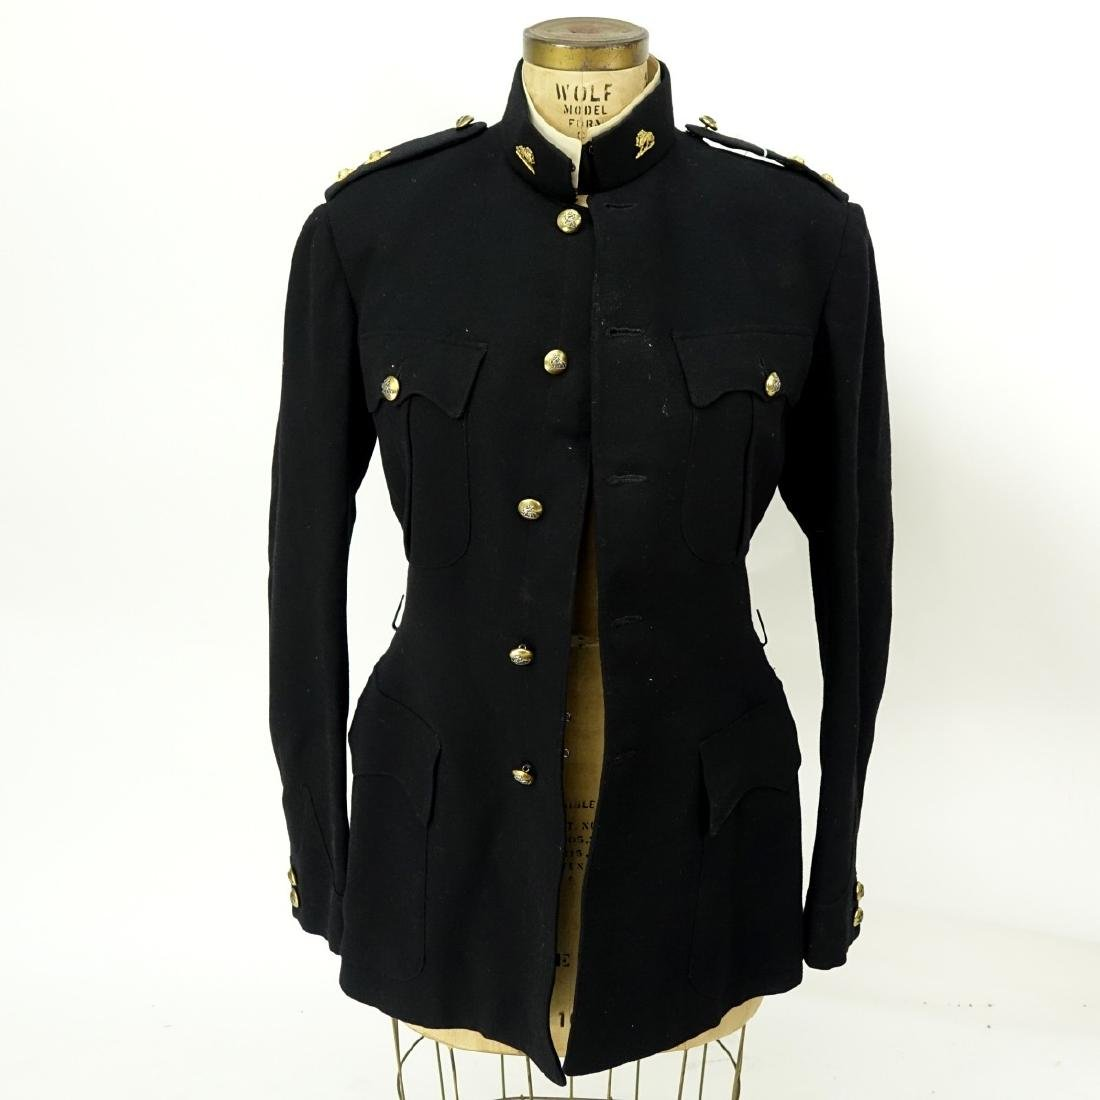 Vintage 2 Piece Military Patrol Uniform - 2